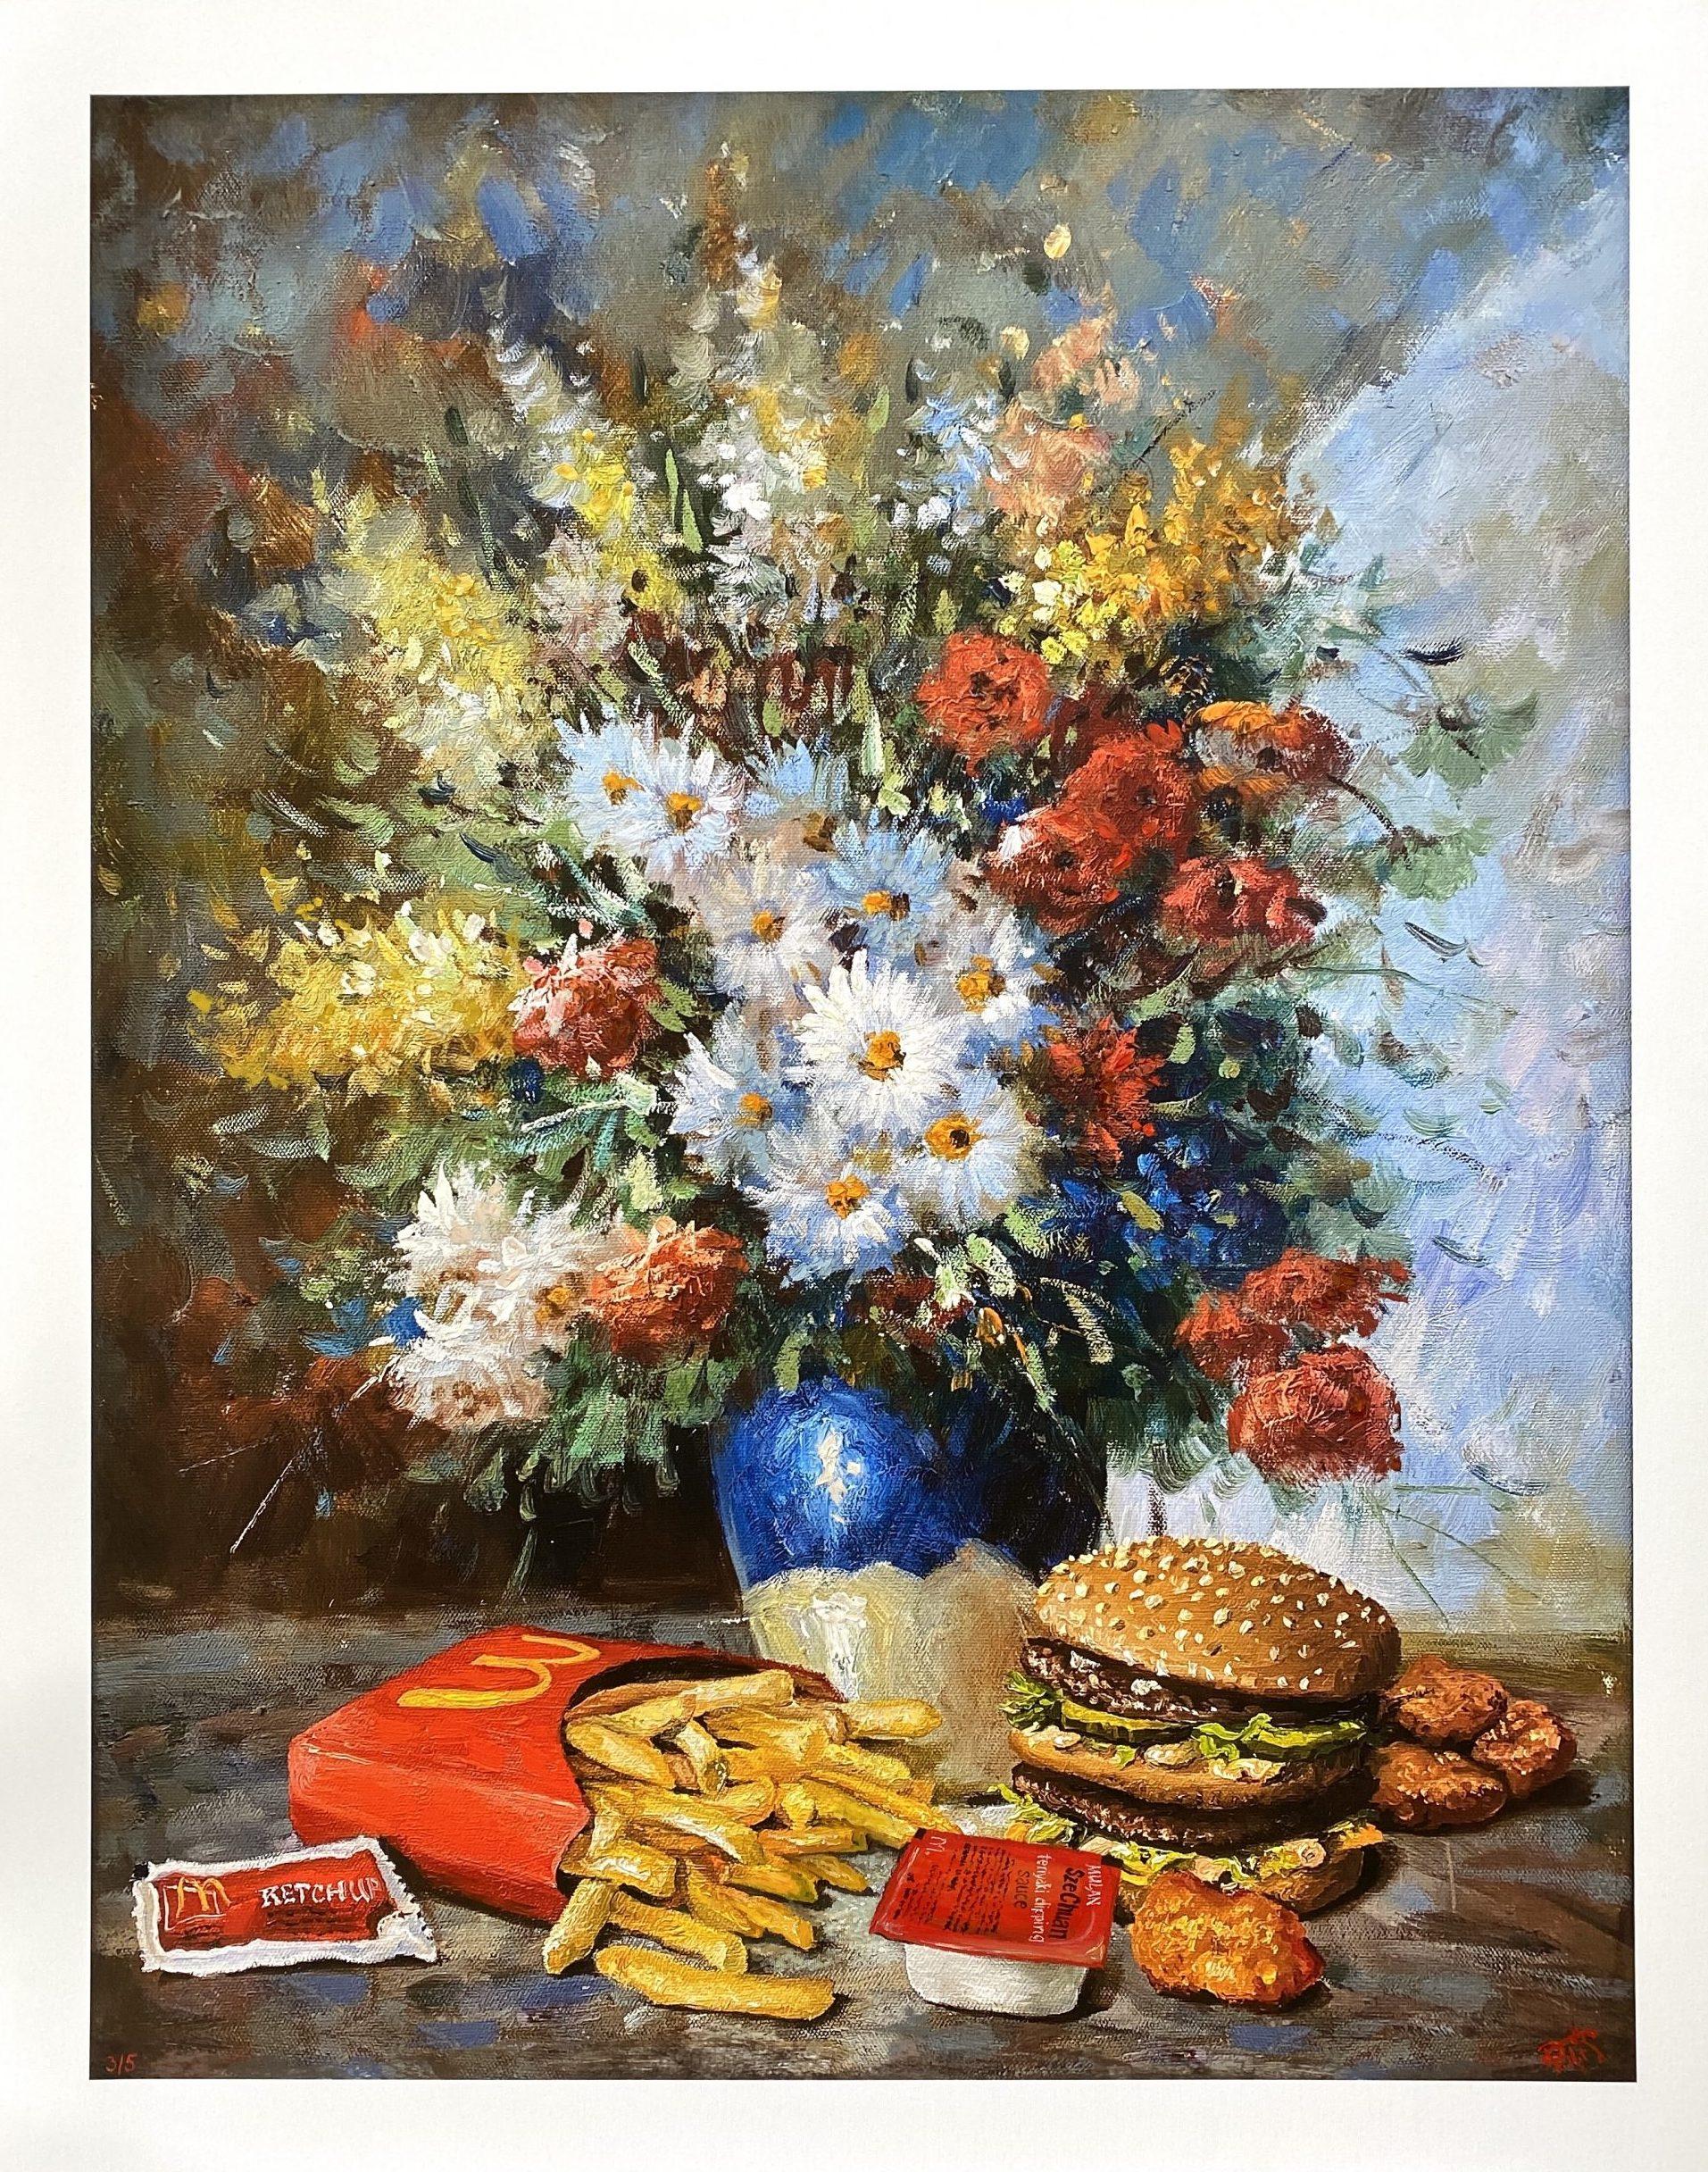 Calorie Composition 8 (SzeChuan Madness) by Dave Pollot